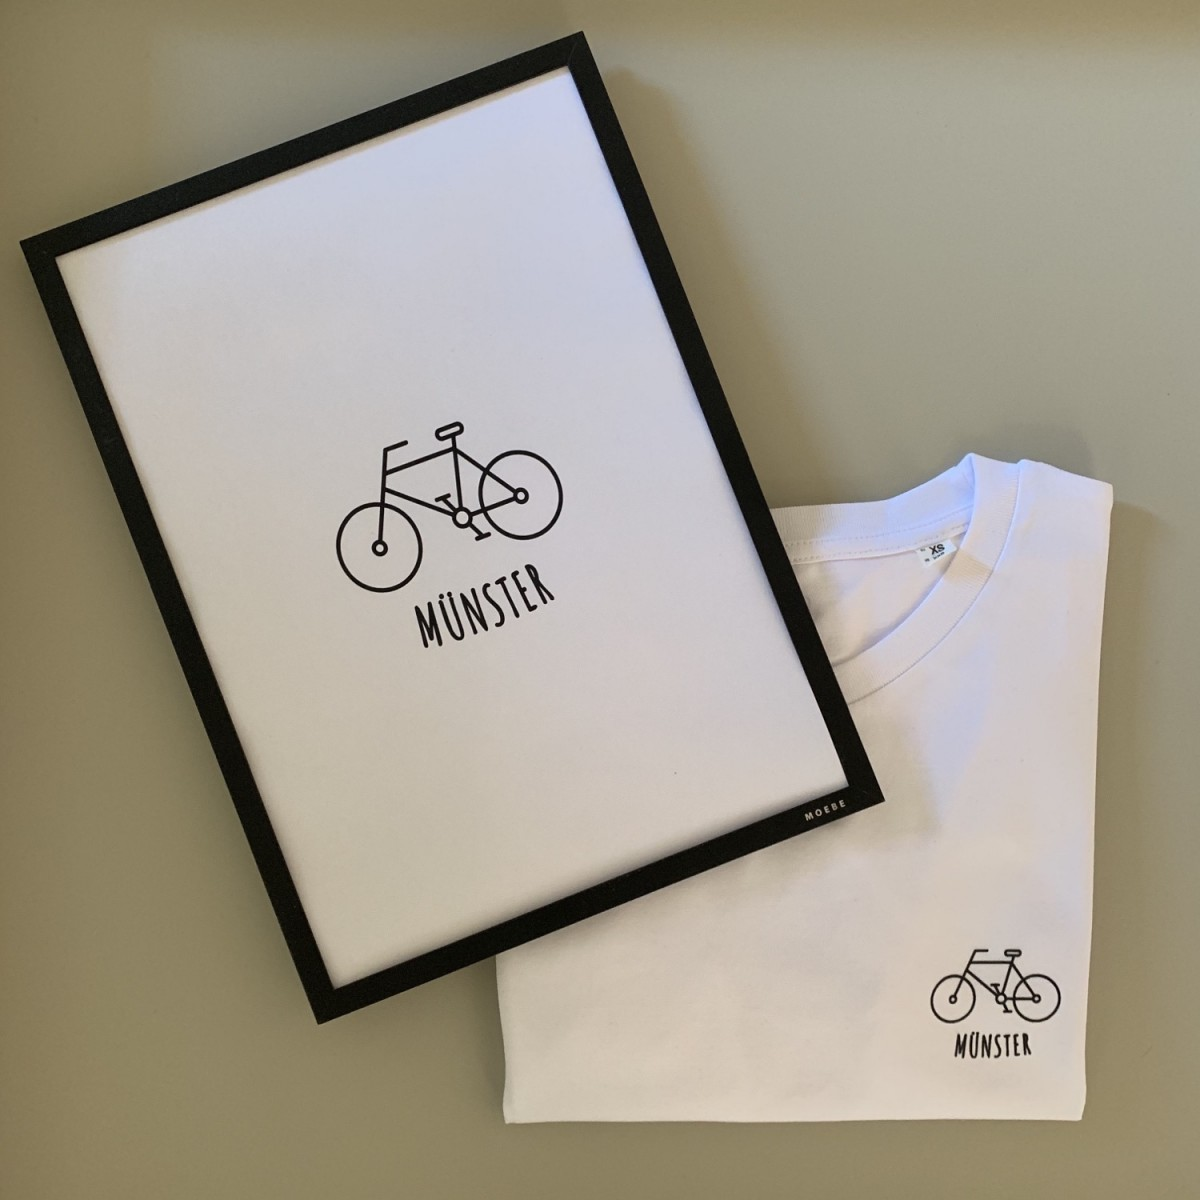 Charles / Shirt Münster / 100% Biobaumwolle / Fair Wear zertifiziert